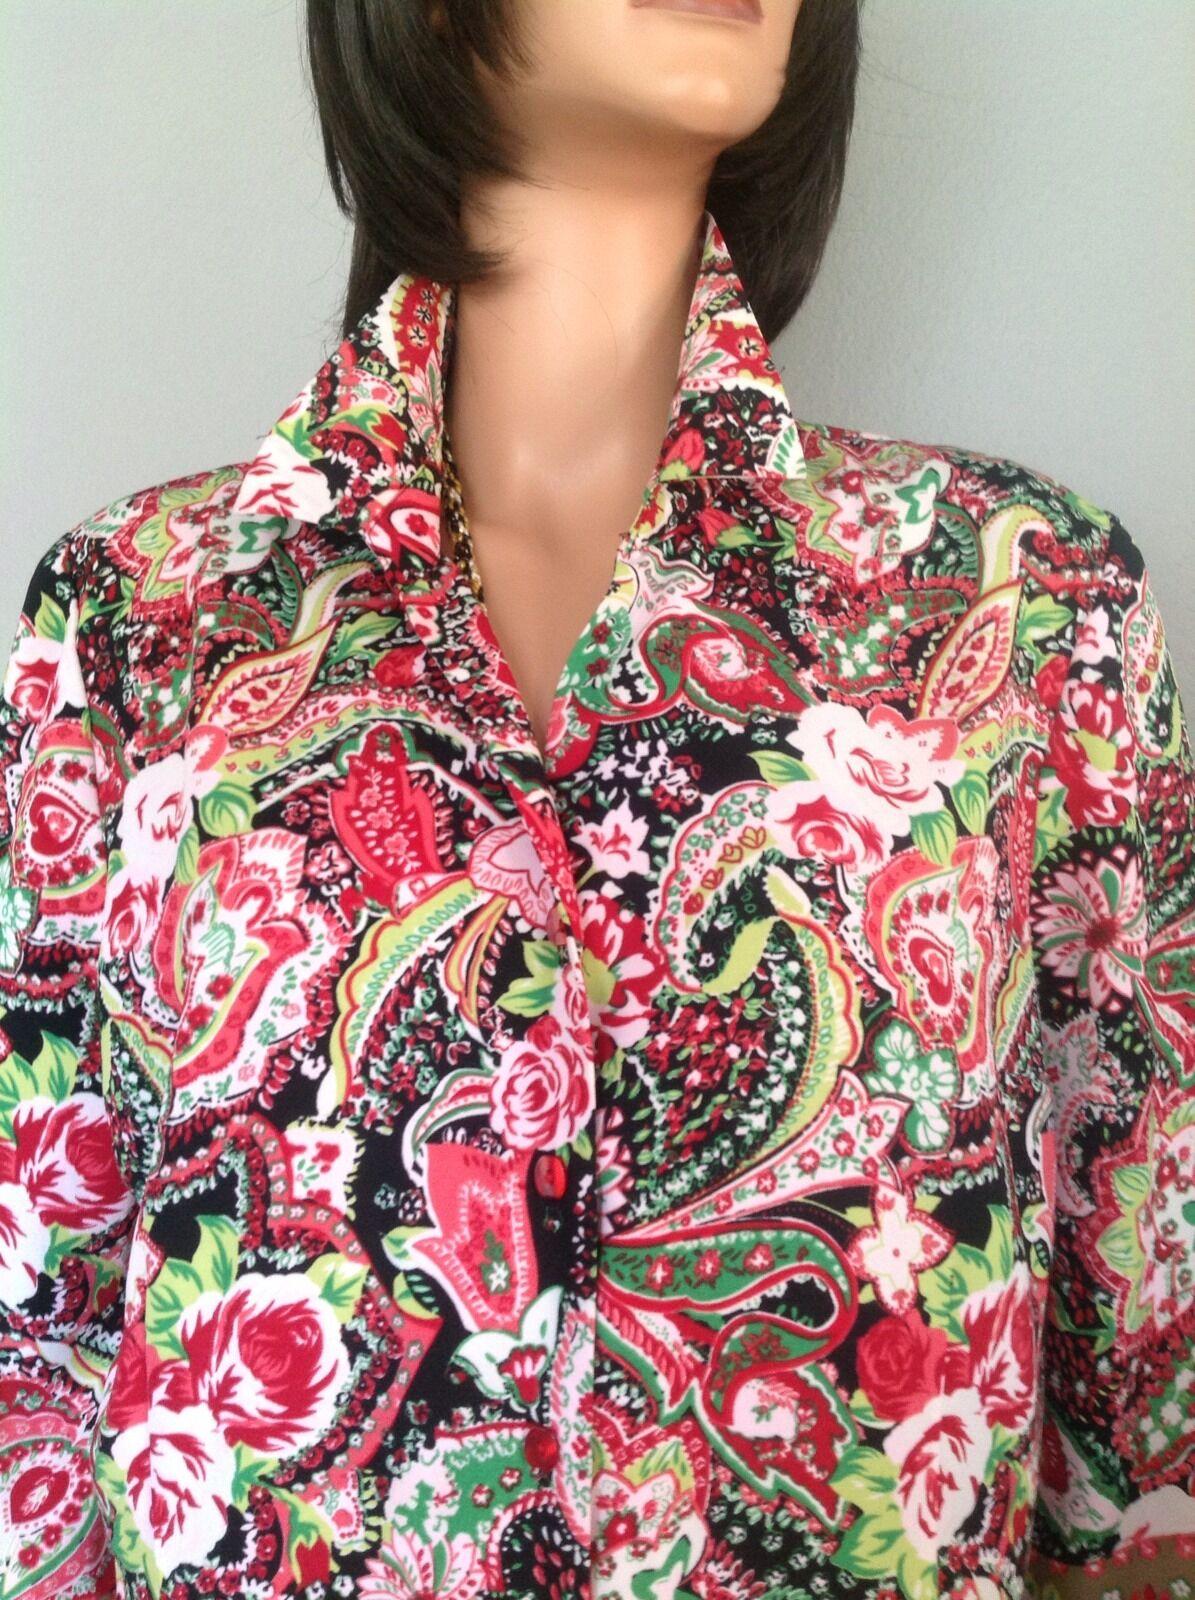 Blouse Women's Button Down 16 Floral Multicolor Feminen Designer Stylish Fashion